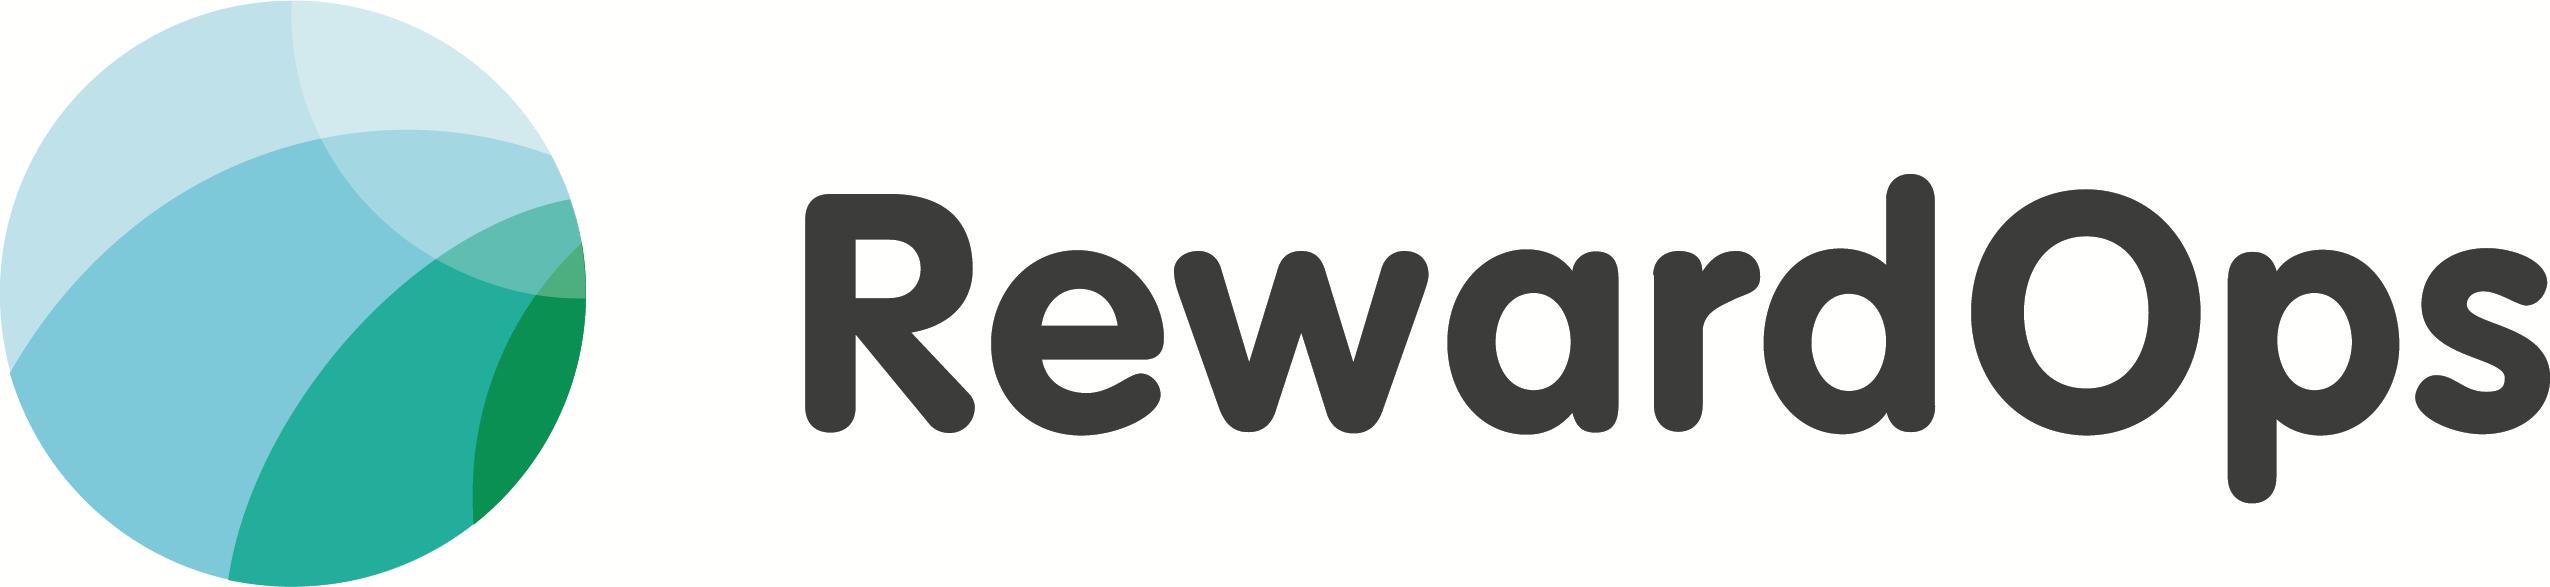 RewardOps Logo